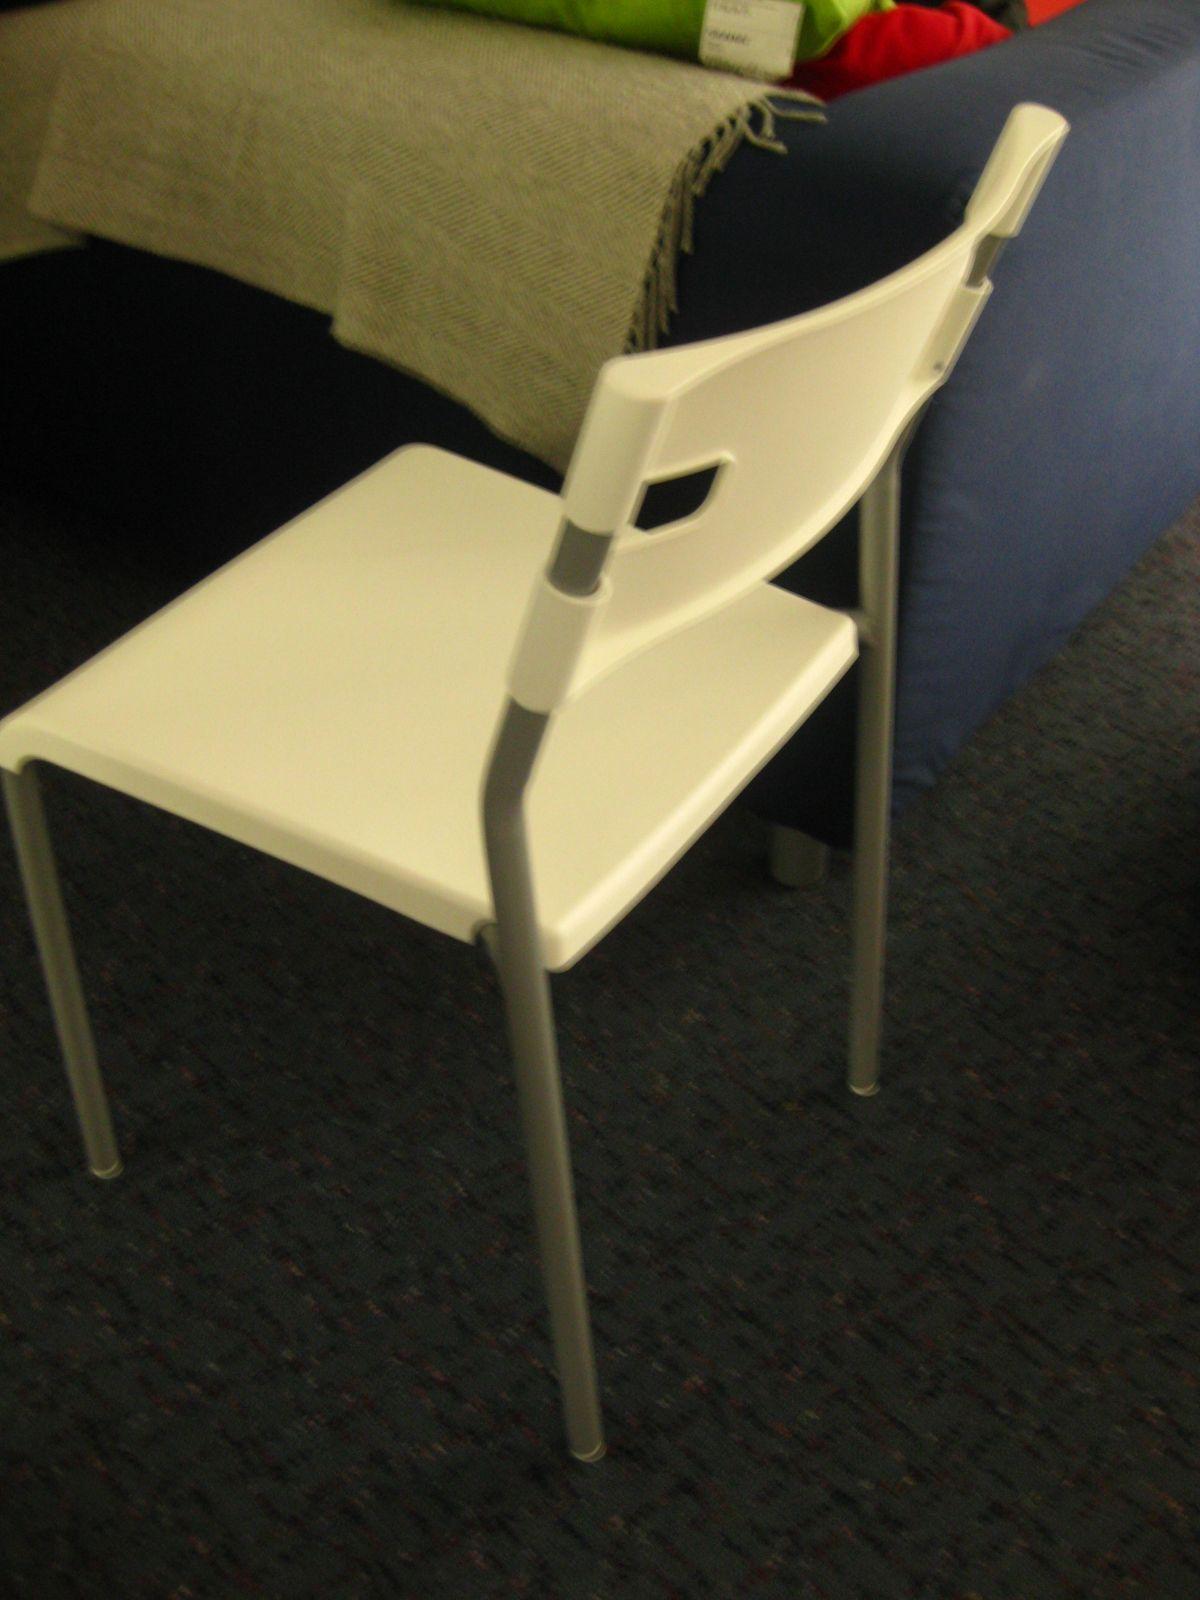 Ikea Chair Mat Wedding Covers Isle Of Wight Saltpeppersugaar Nike Yoga Sq Table